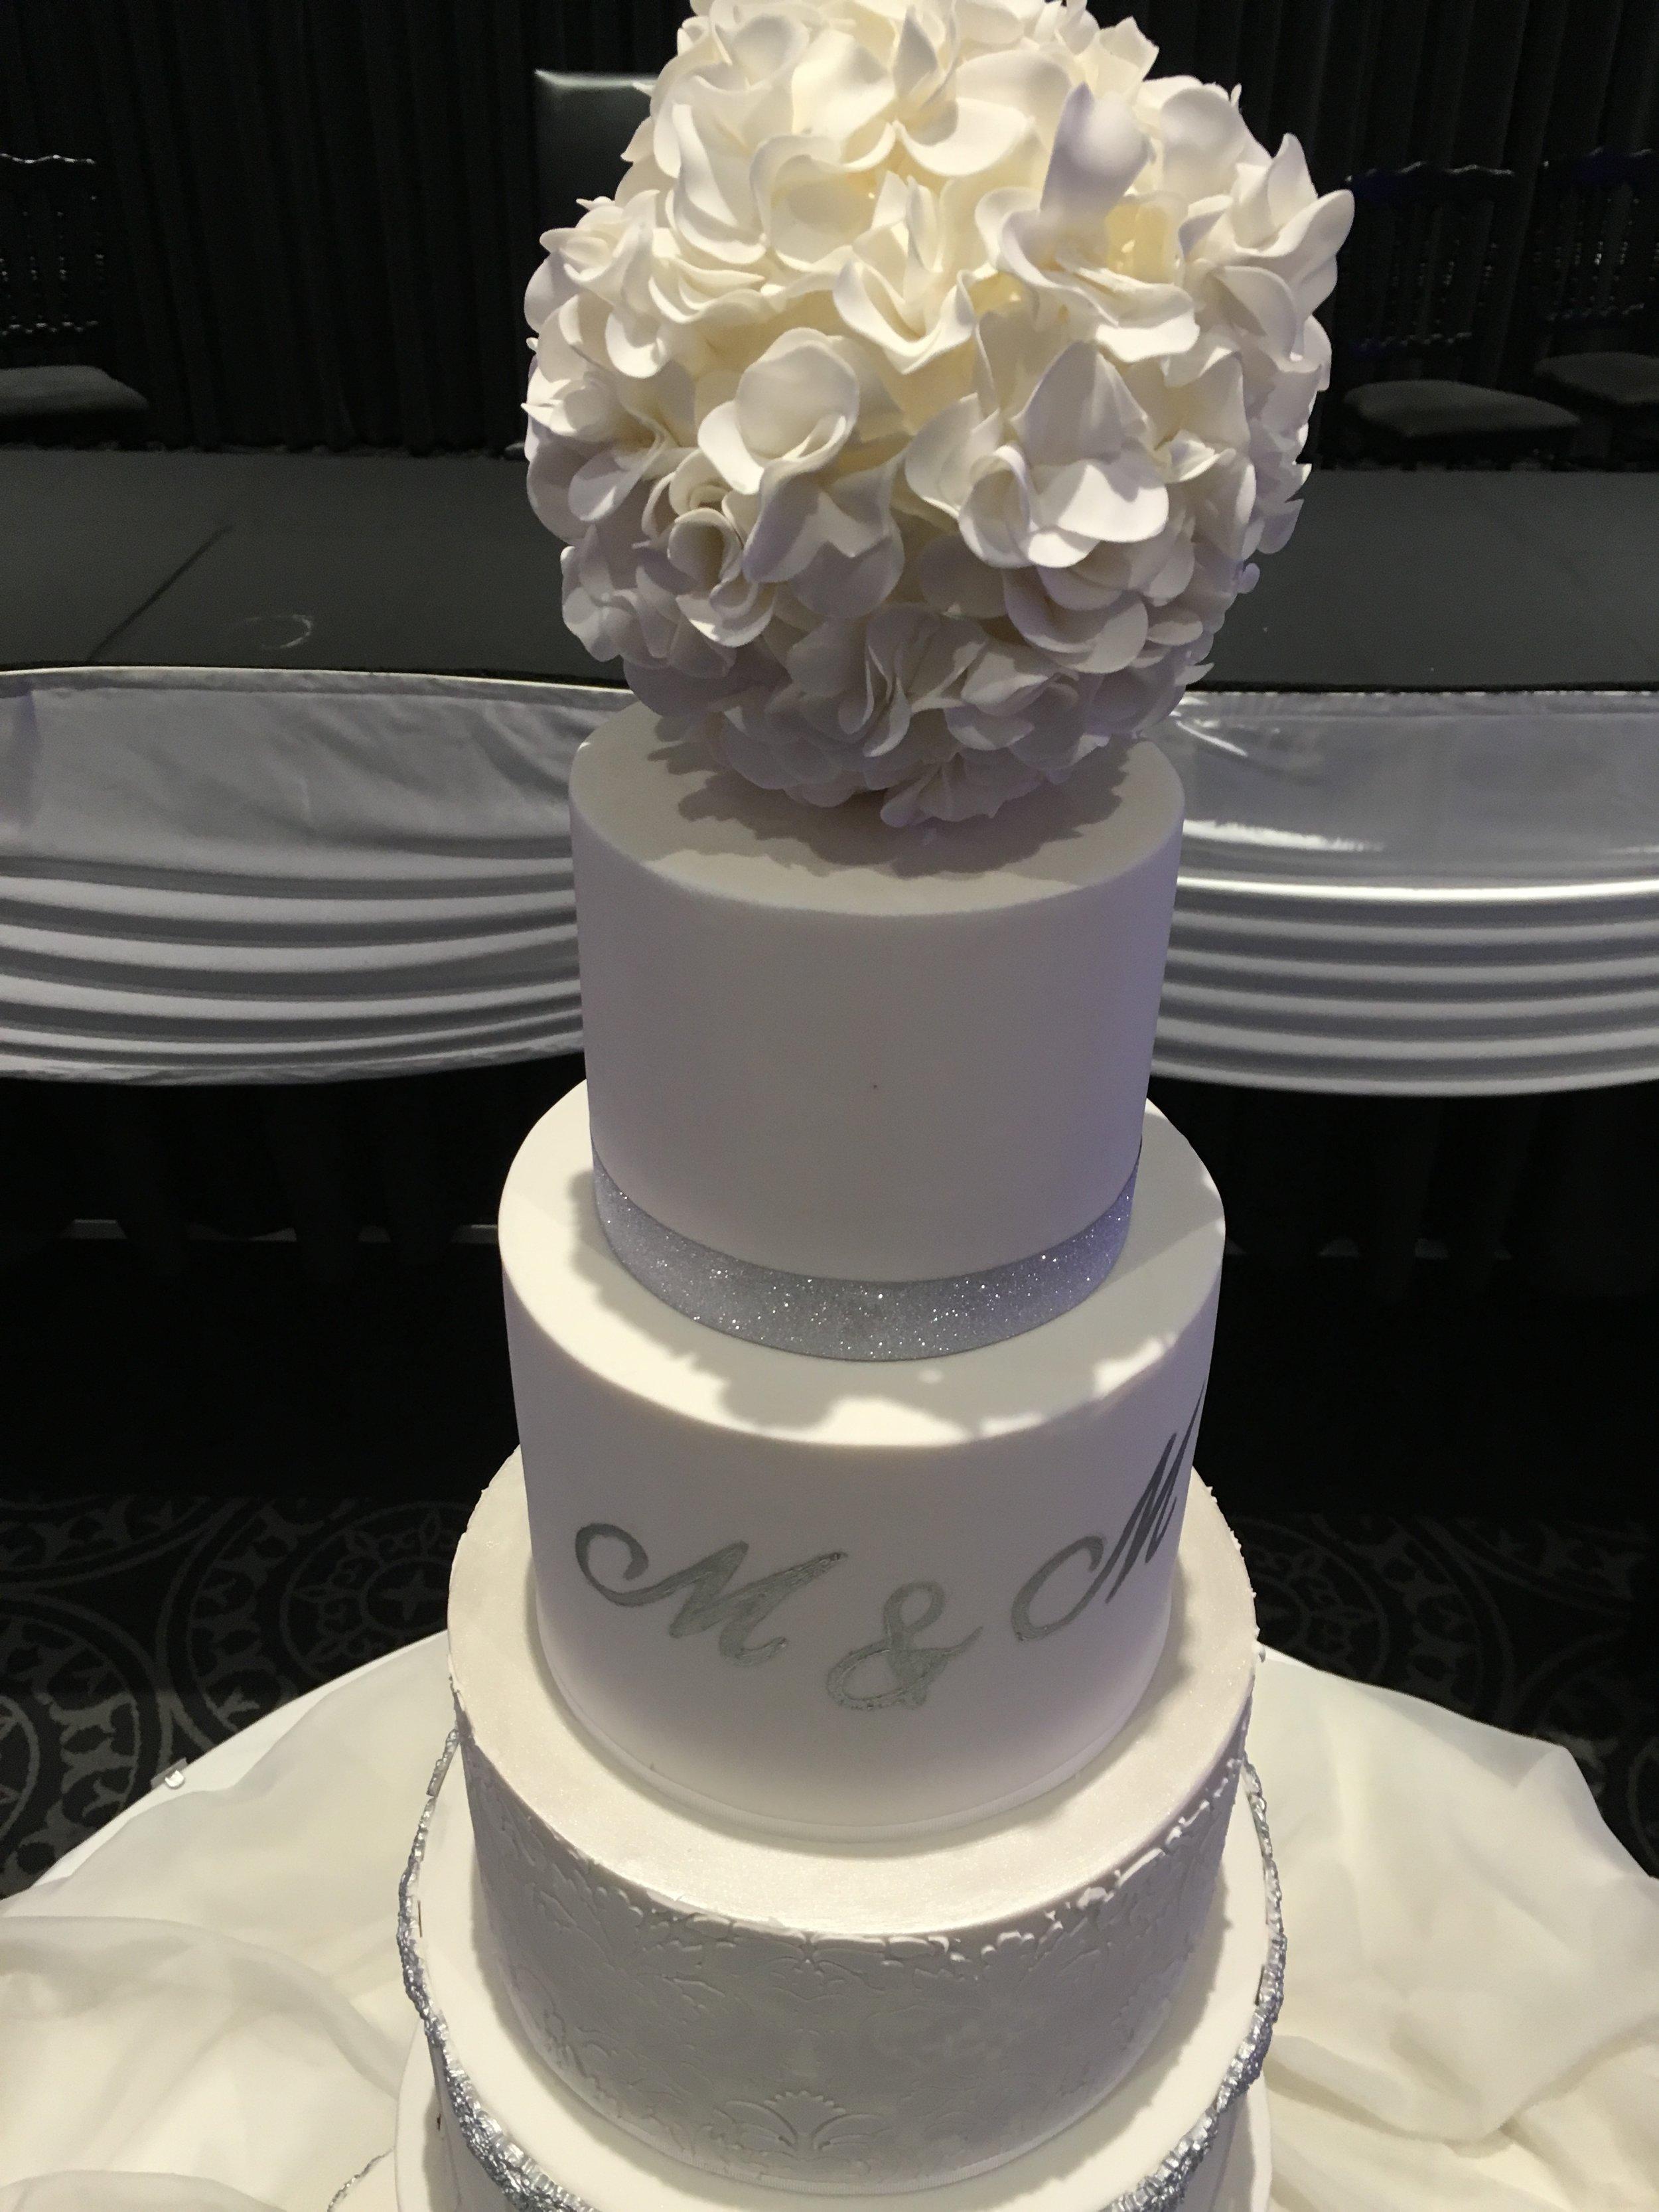 6 Tier Showstopper Wedding Cake